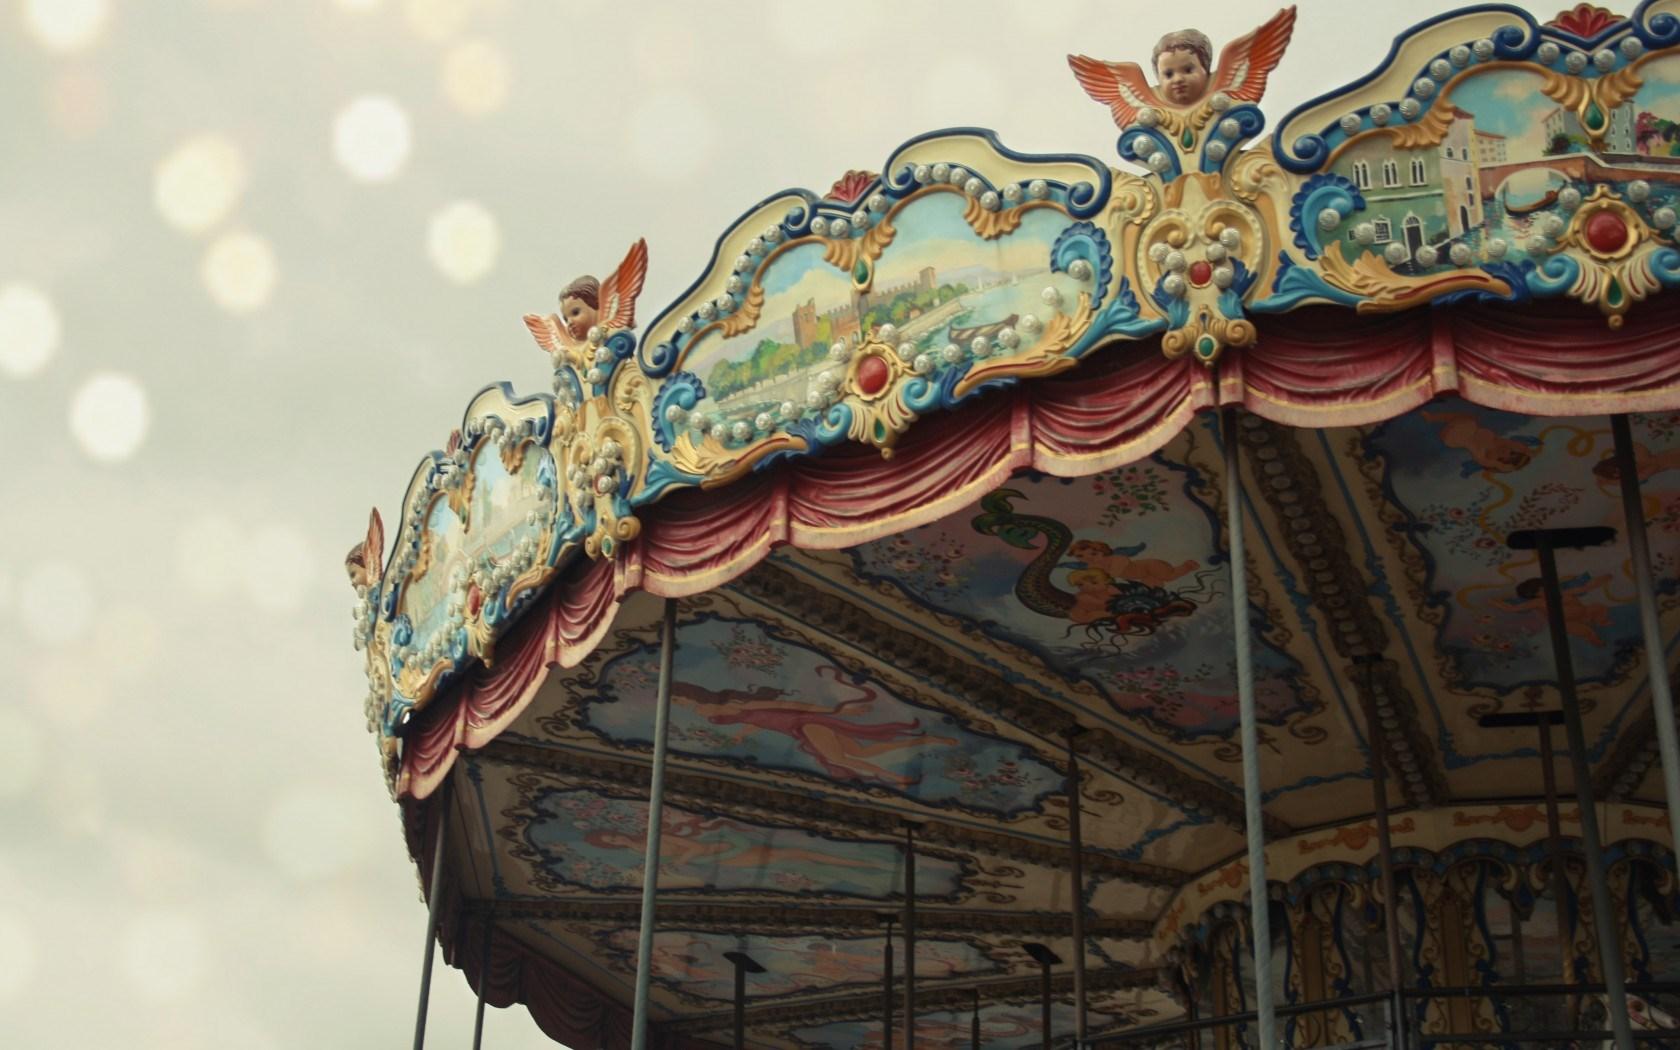 Carousel Entertainment Angels